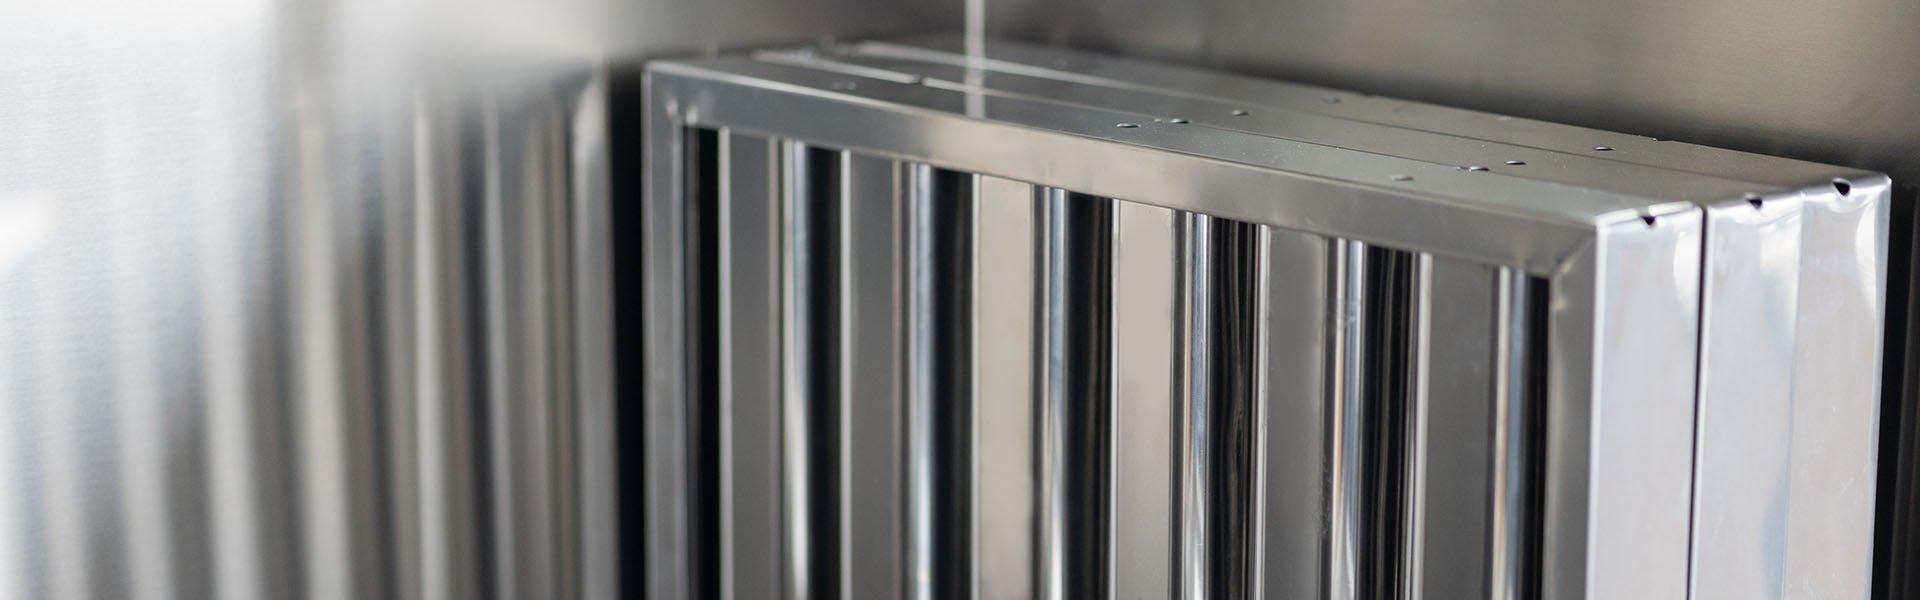 termoactivos para lavautensilios desengrasante iniciasystems